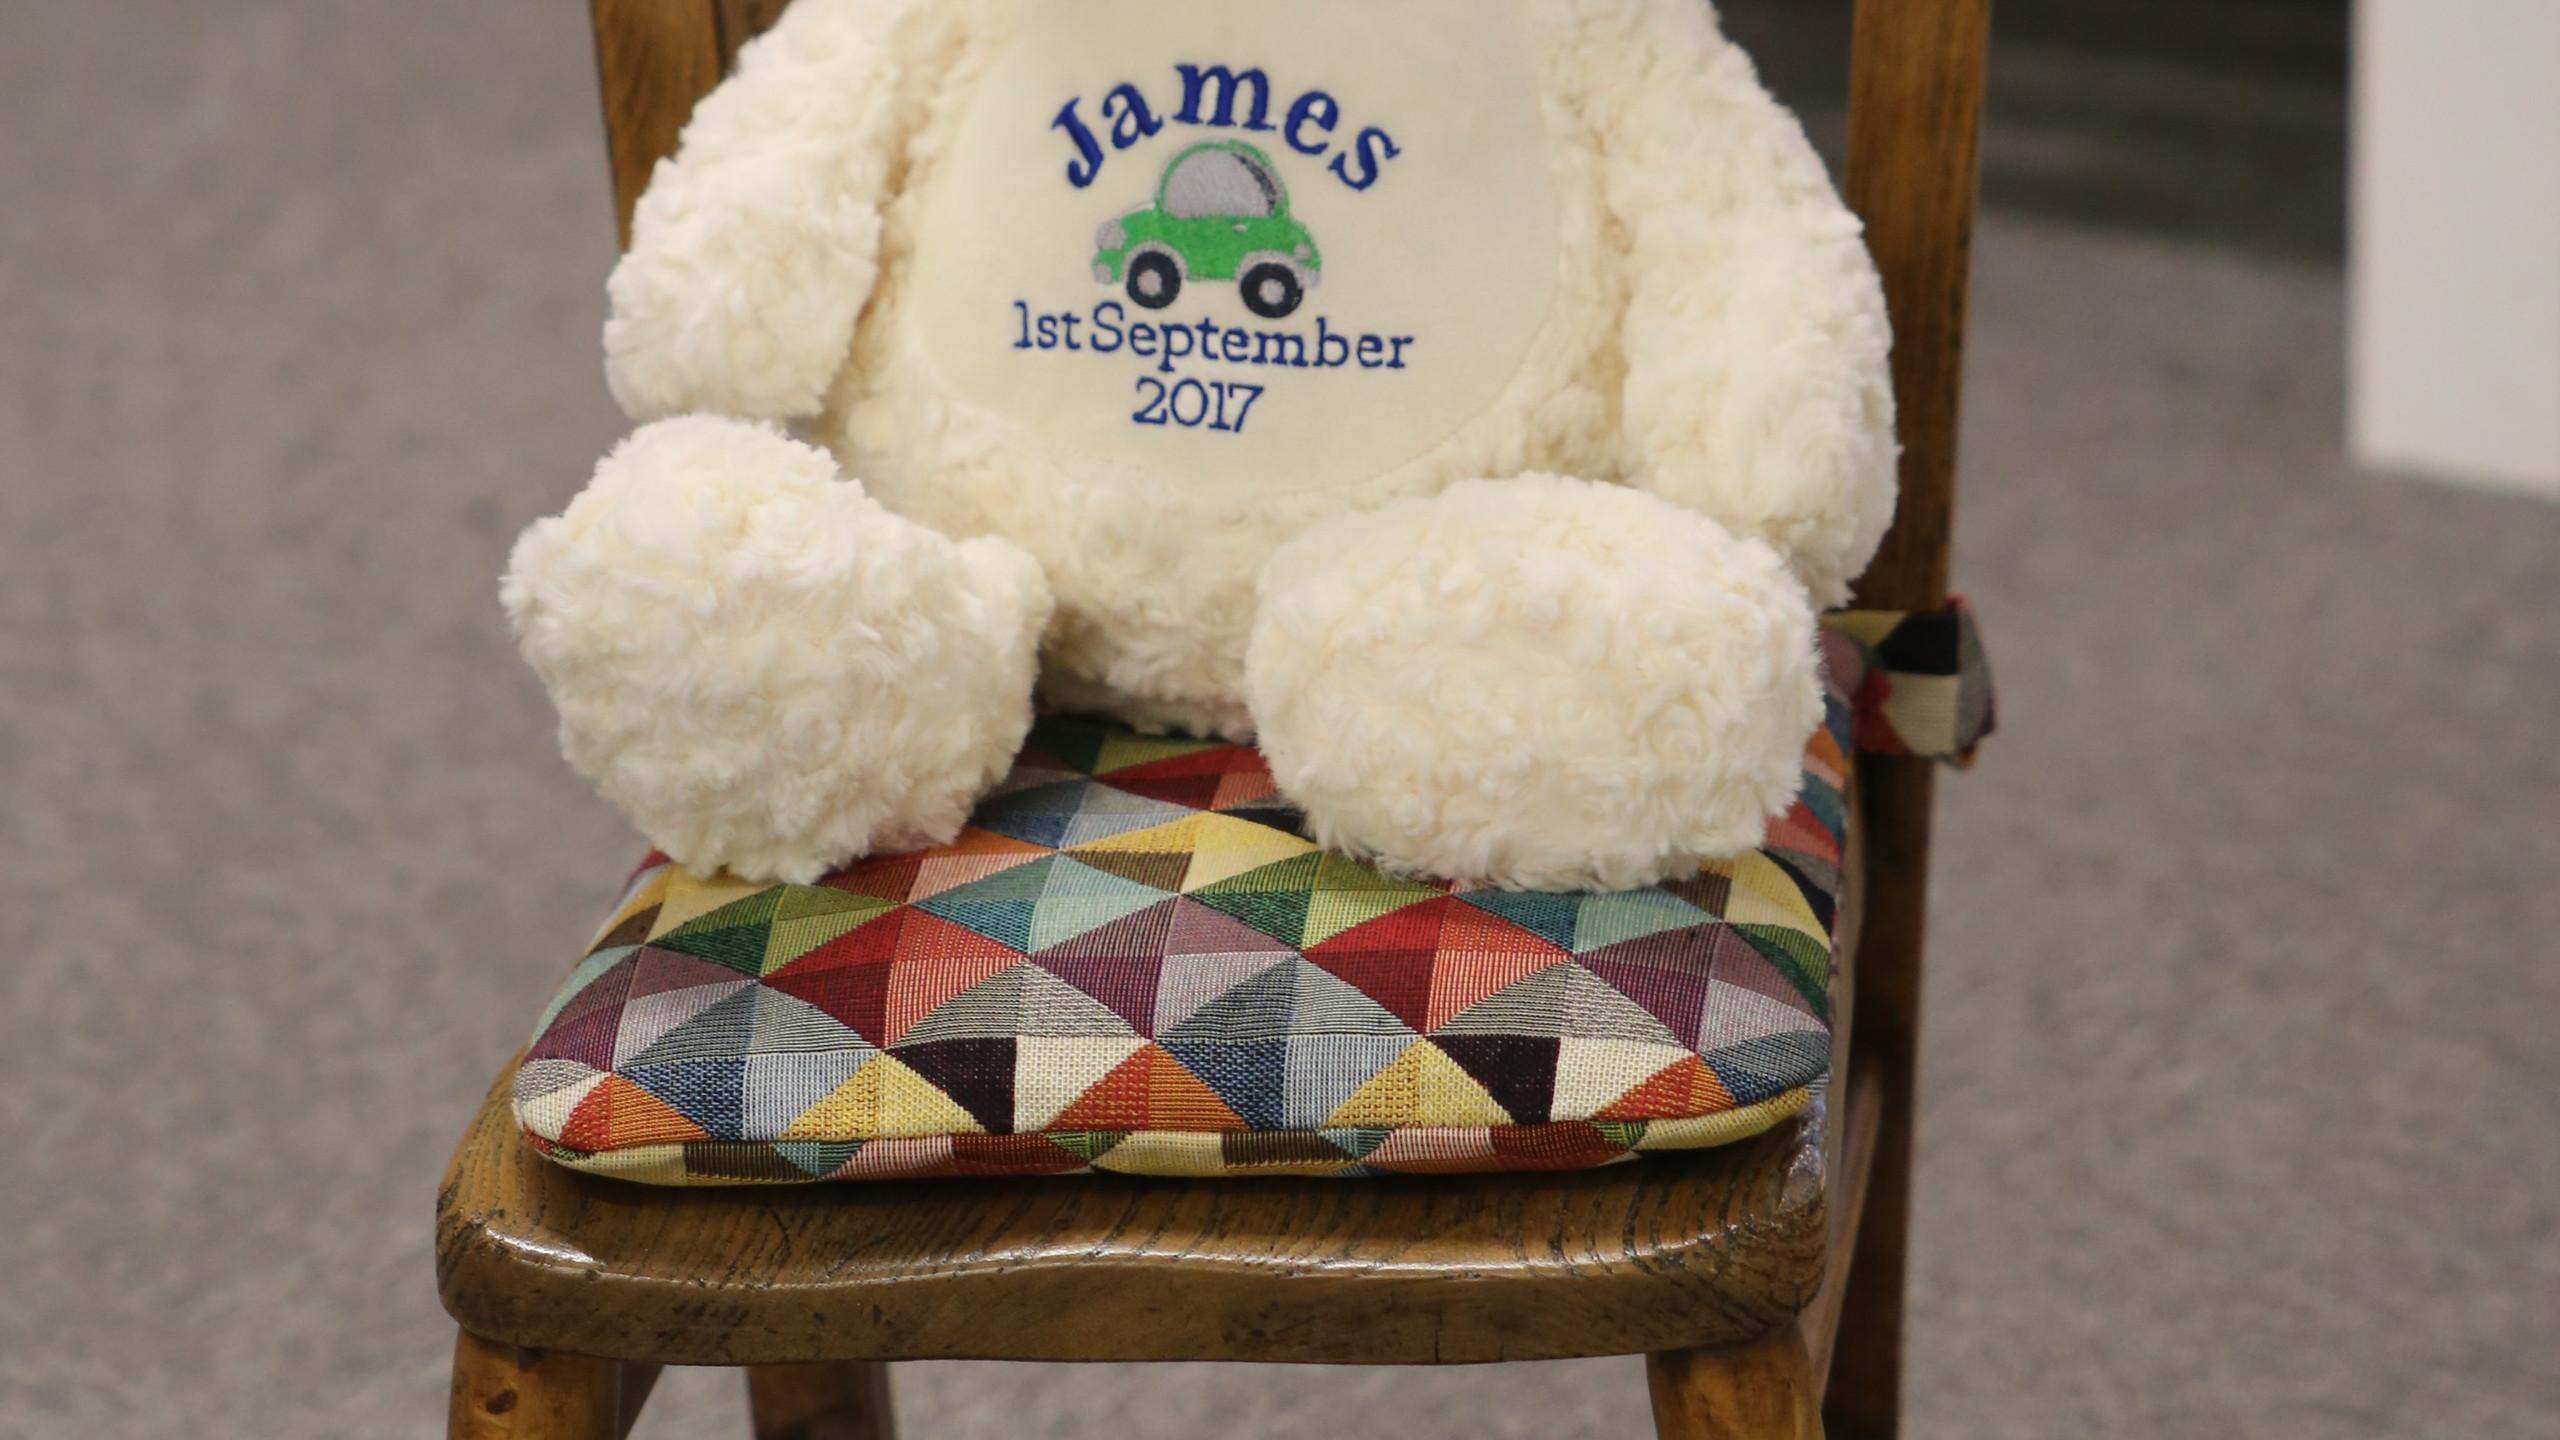 James sitting comfortably